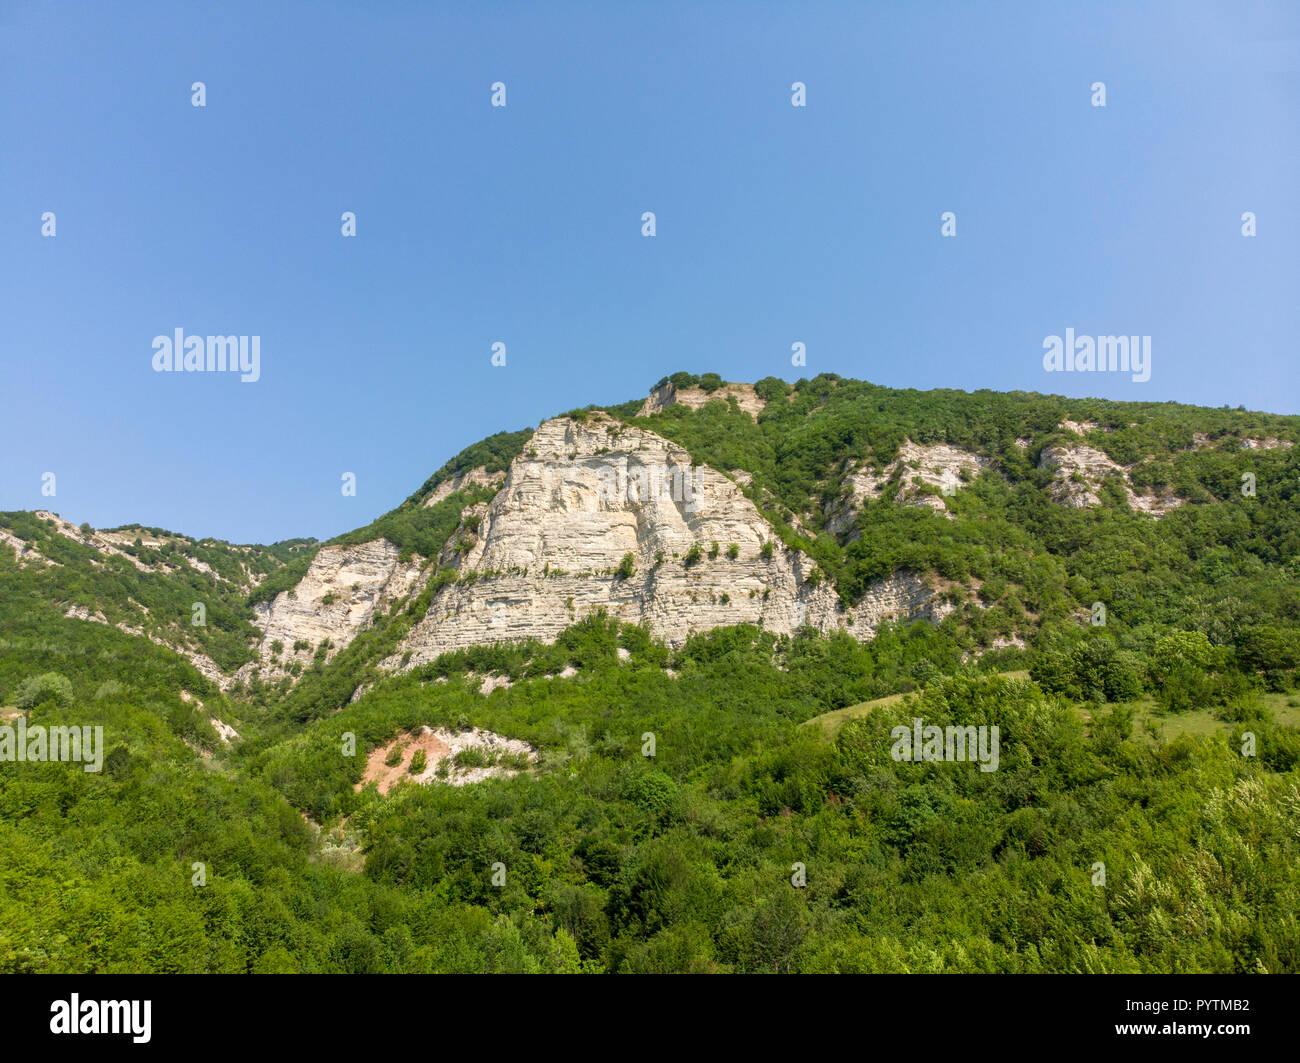 Afurja Waterfall. Afurdzhi Falls Is Located in Quba Azerbaijan. Areal Dron Shoot. - Stock Image